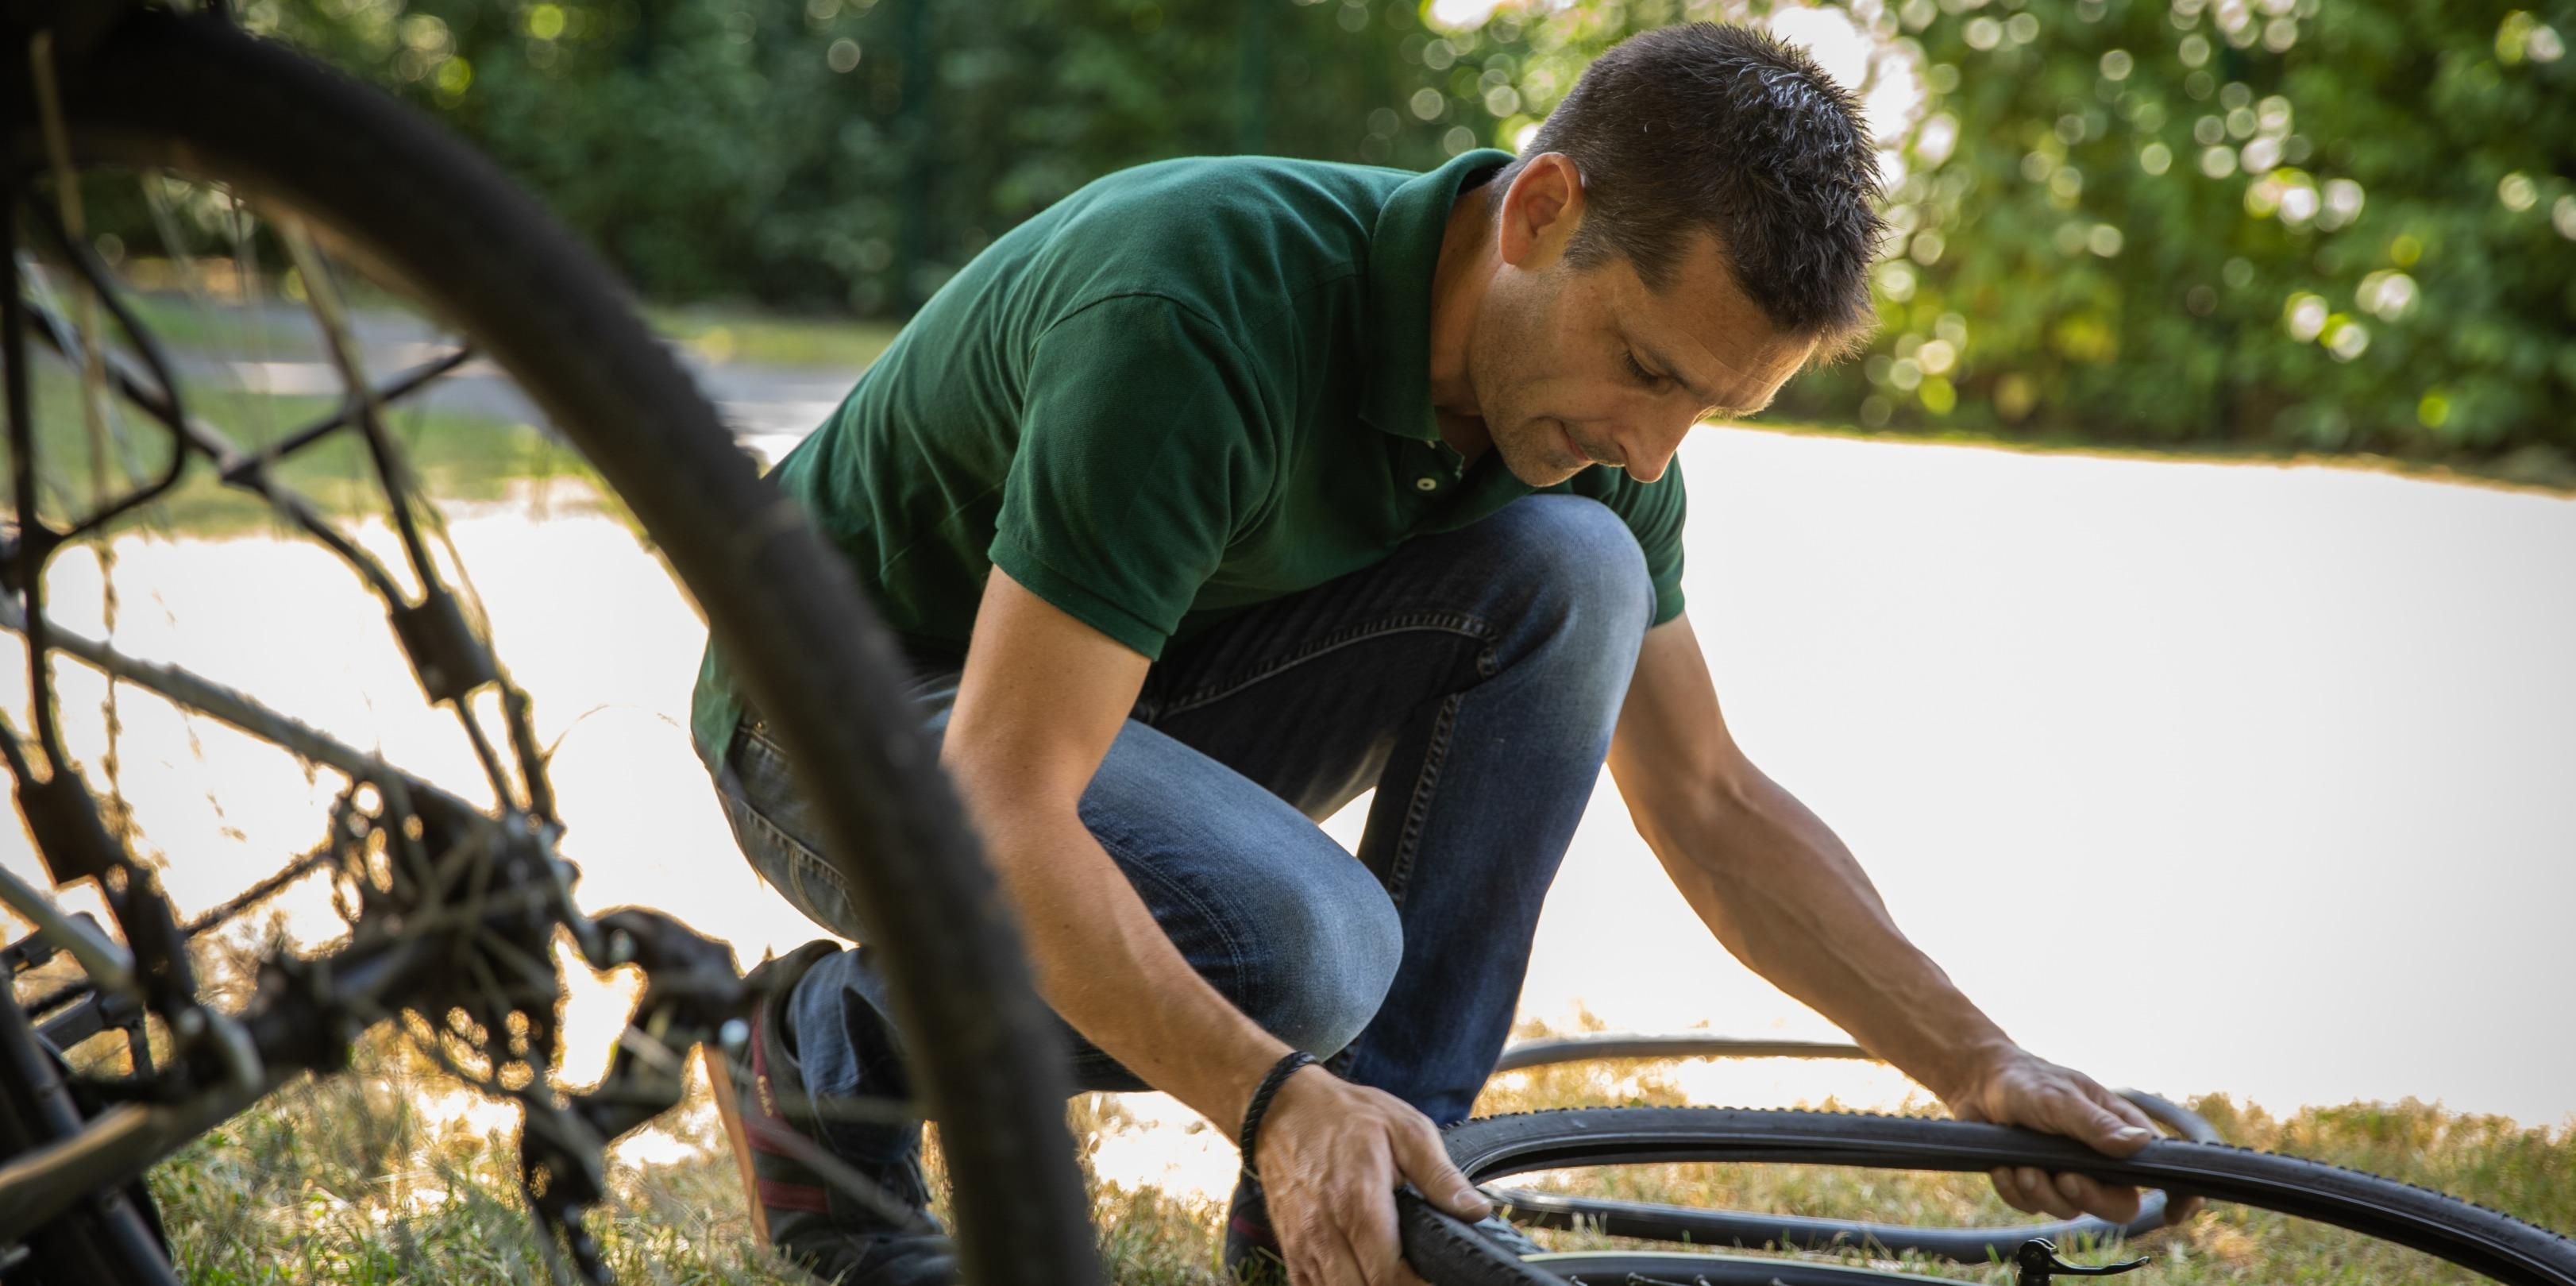 Our Top 5 Tips For Safe Mountain Biking